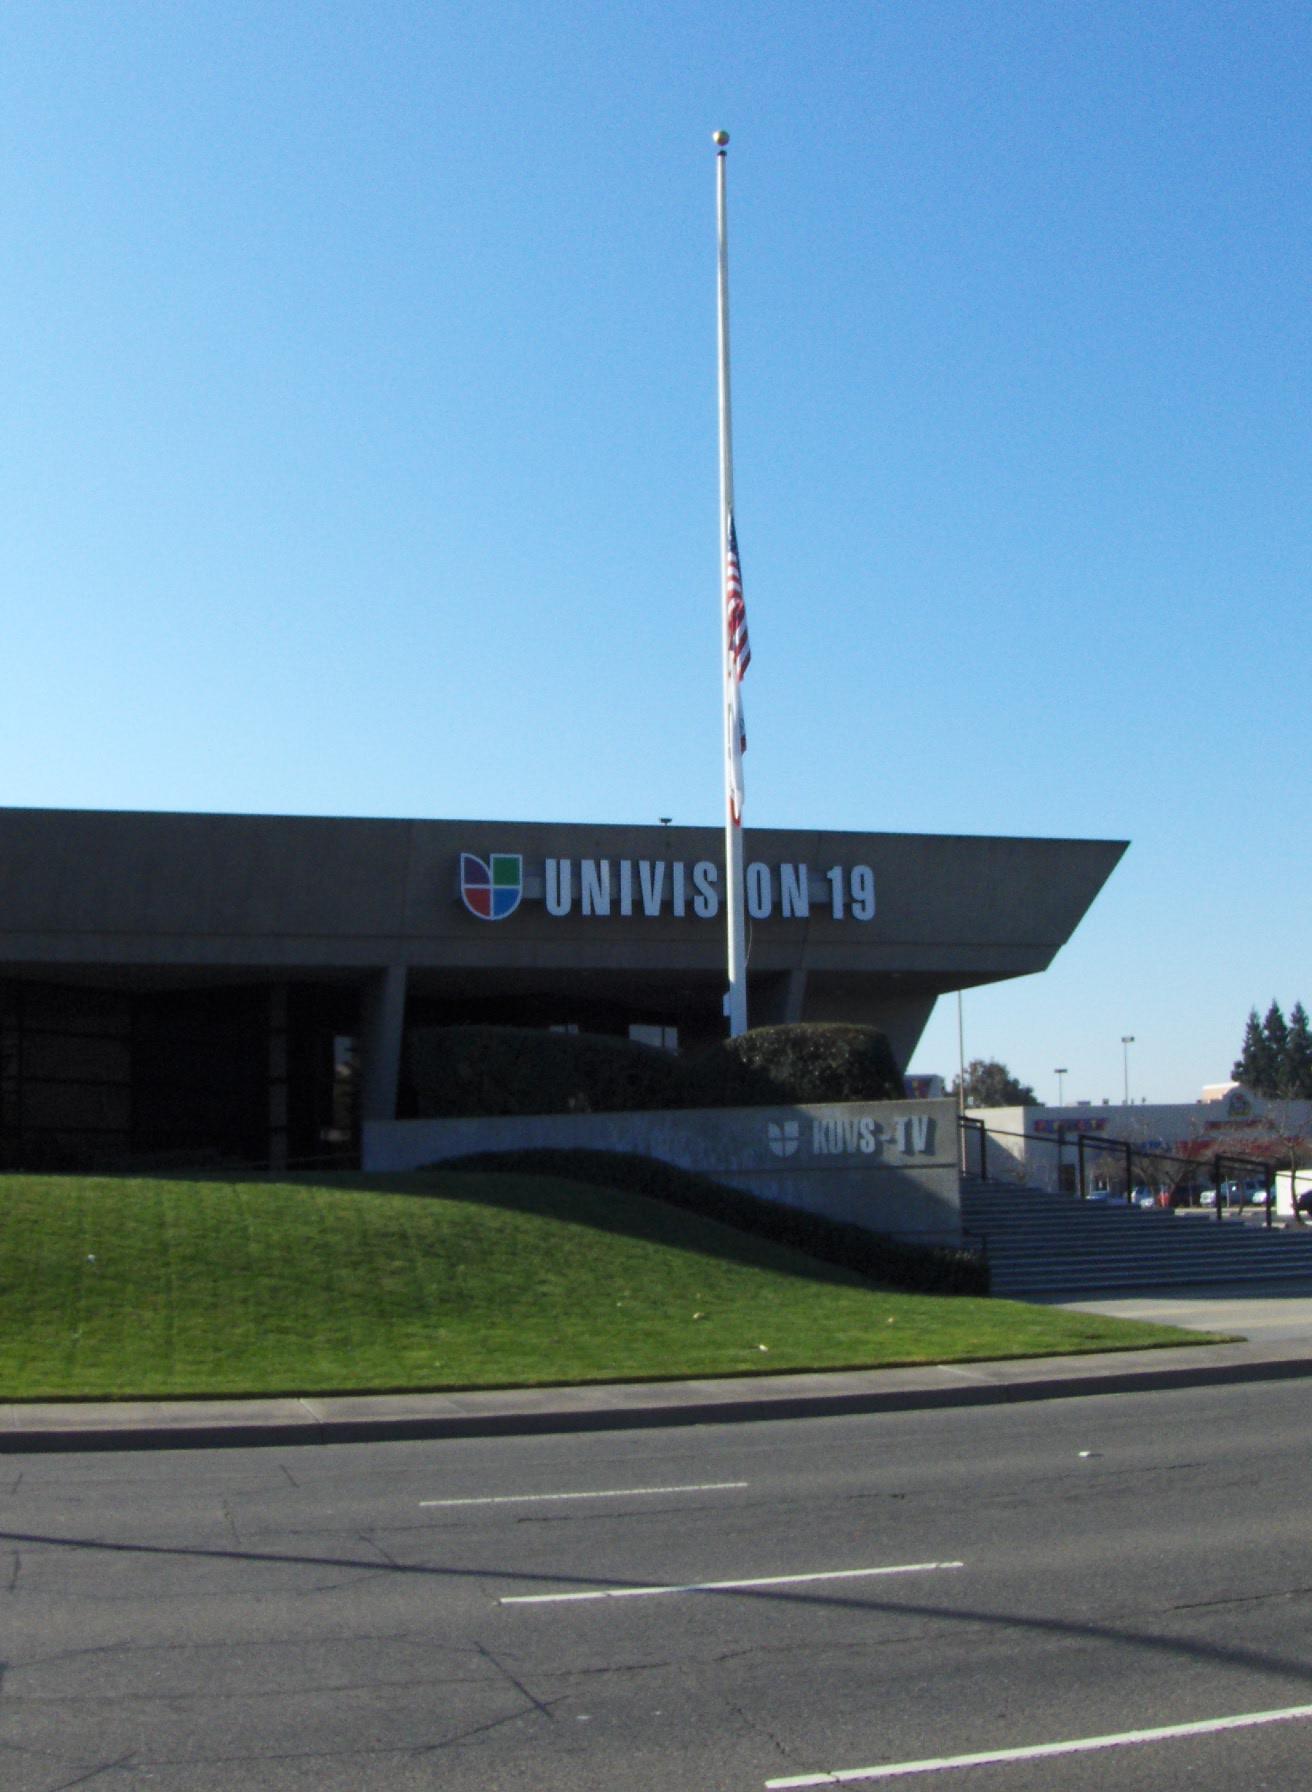 File Kuvs Tv Univision 19 Kuvs In Sacramento Ca Jpg